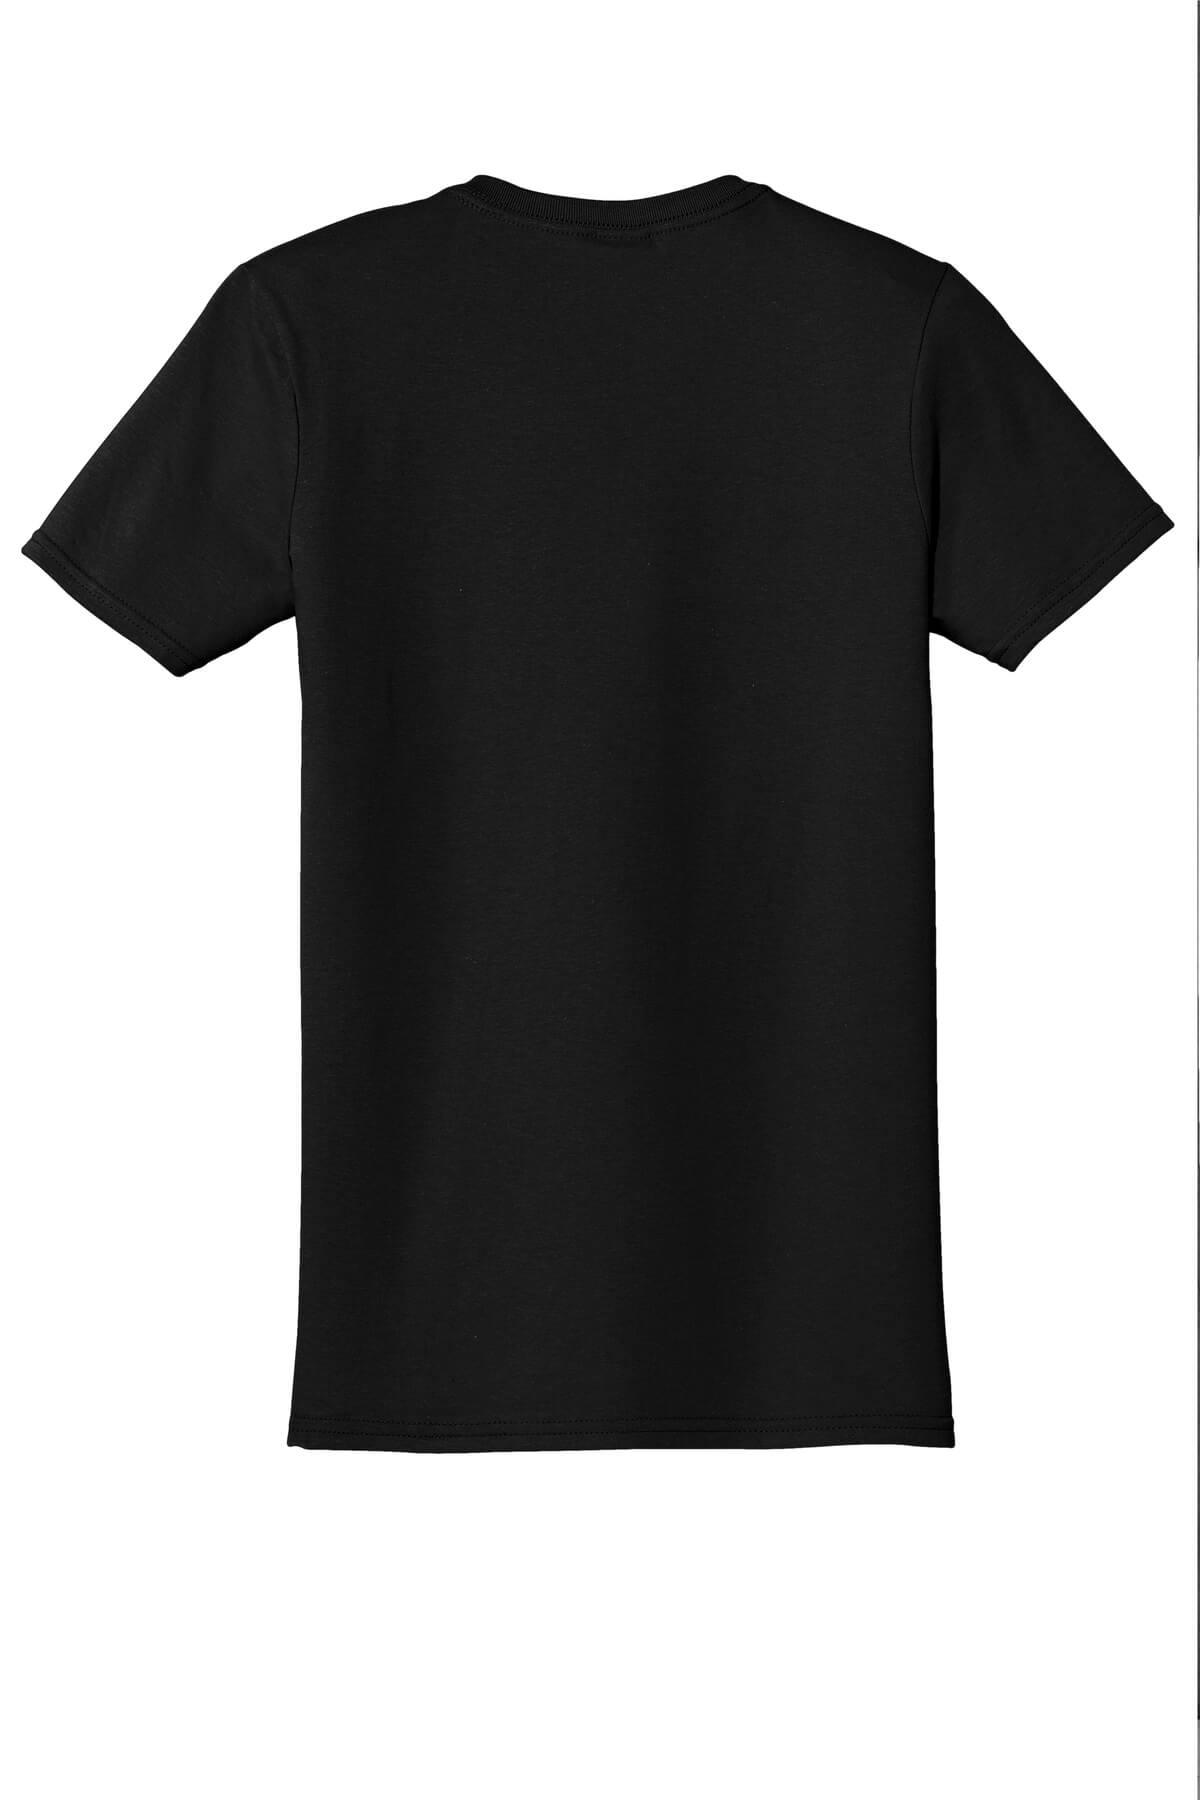 Black T-Shirt Back